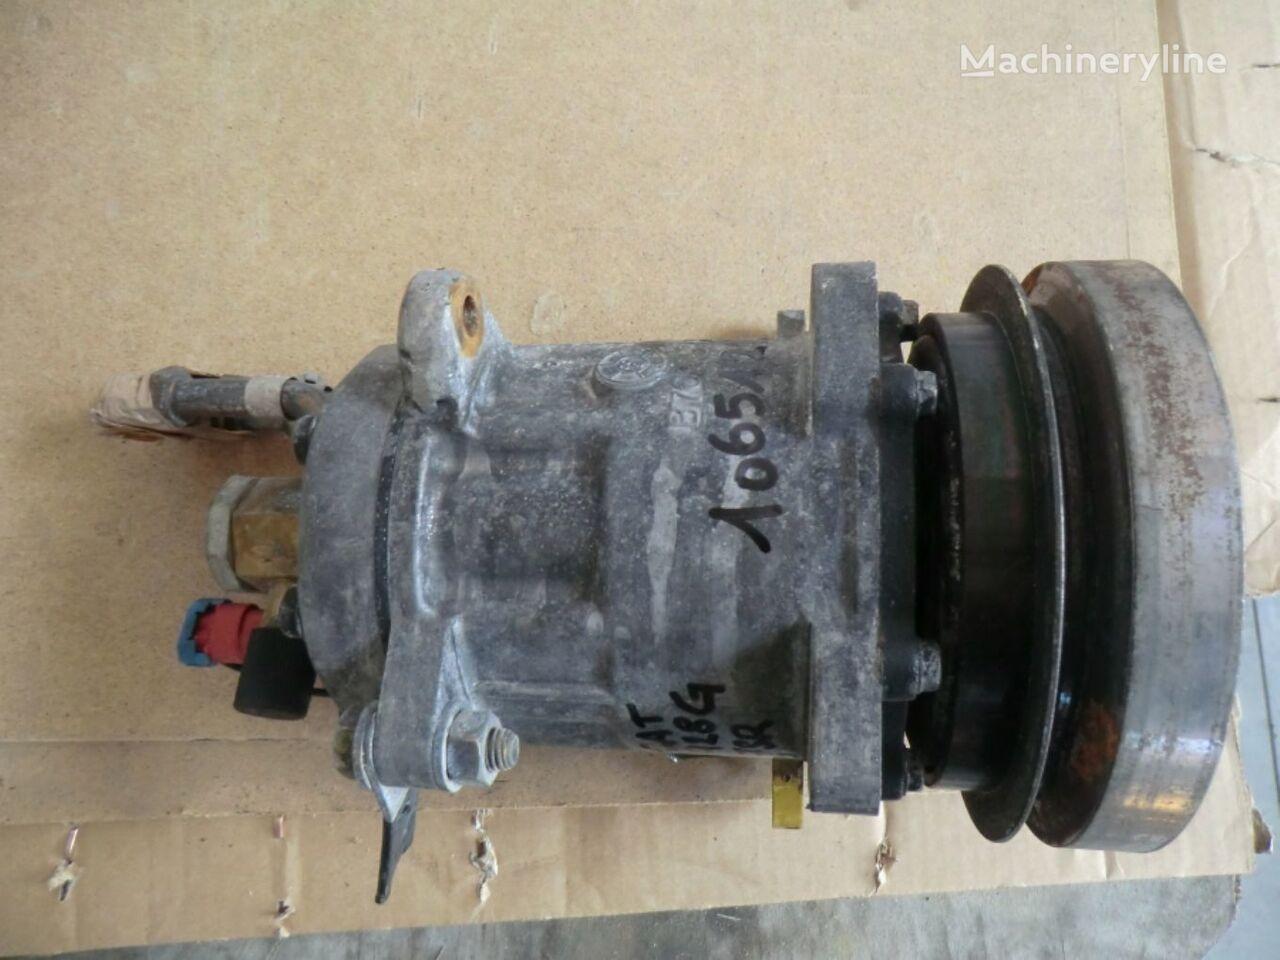 7SR01935 AC compressor for Caterpillar 928G  wheel loader